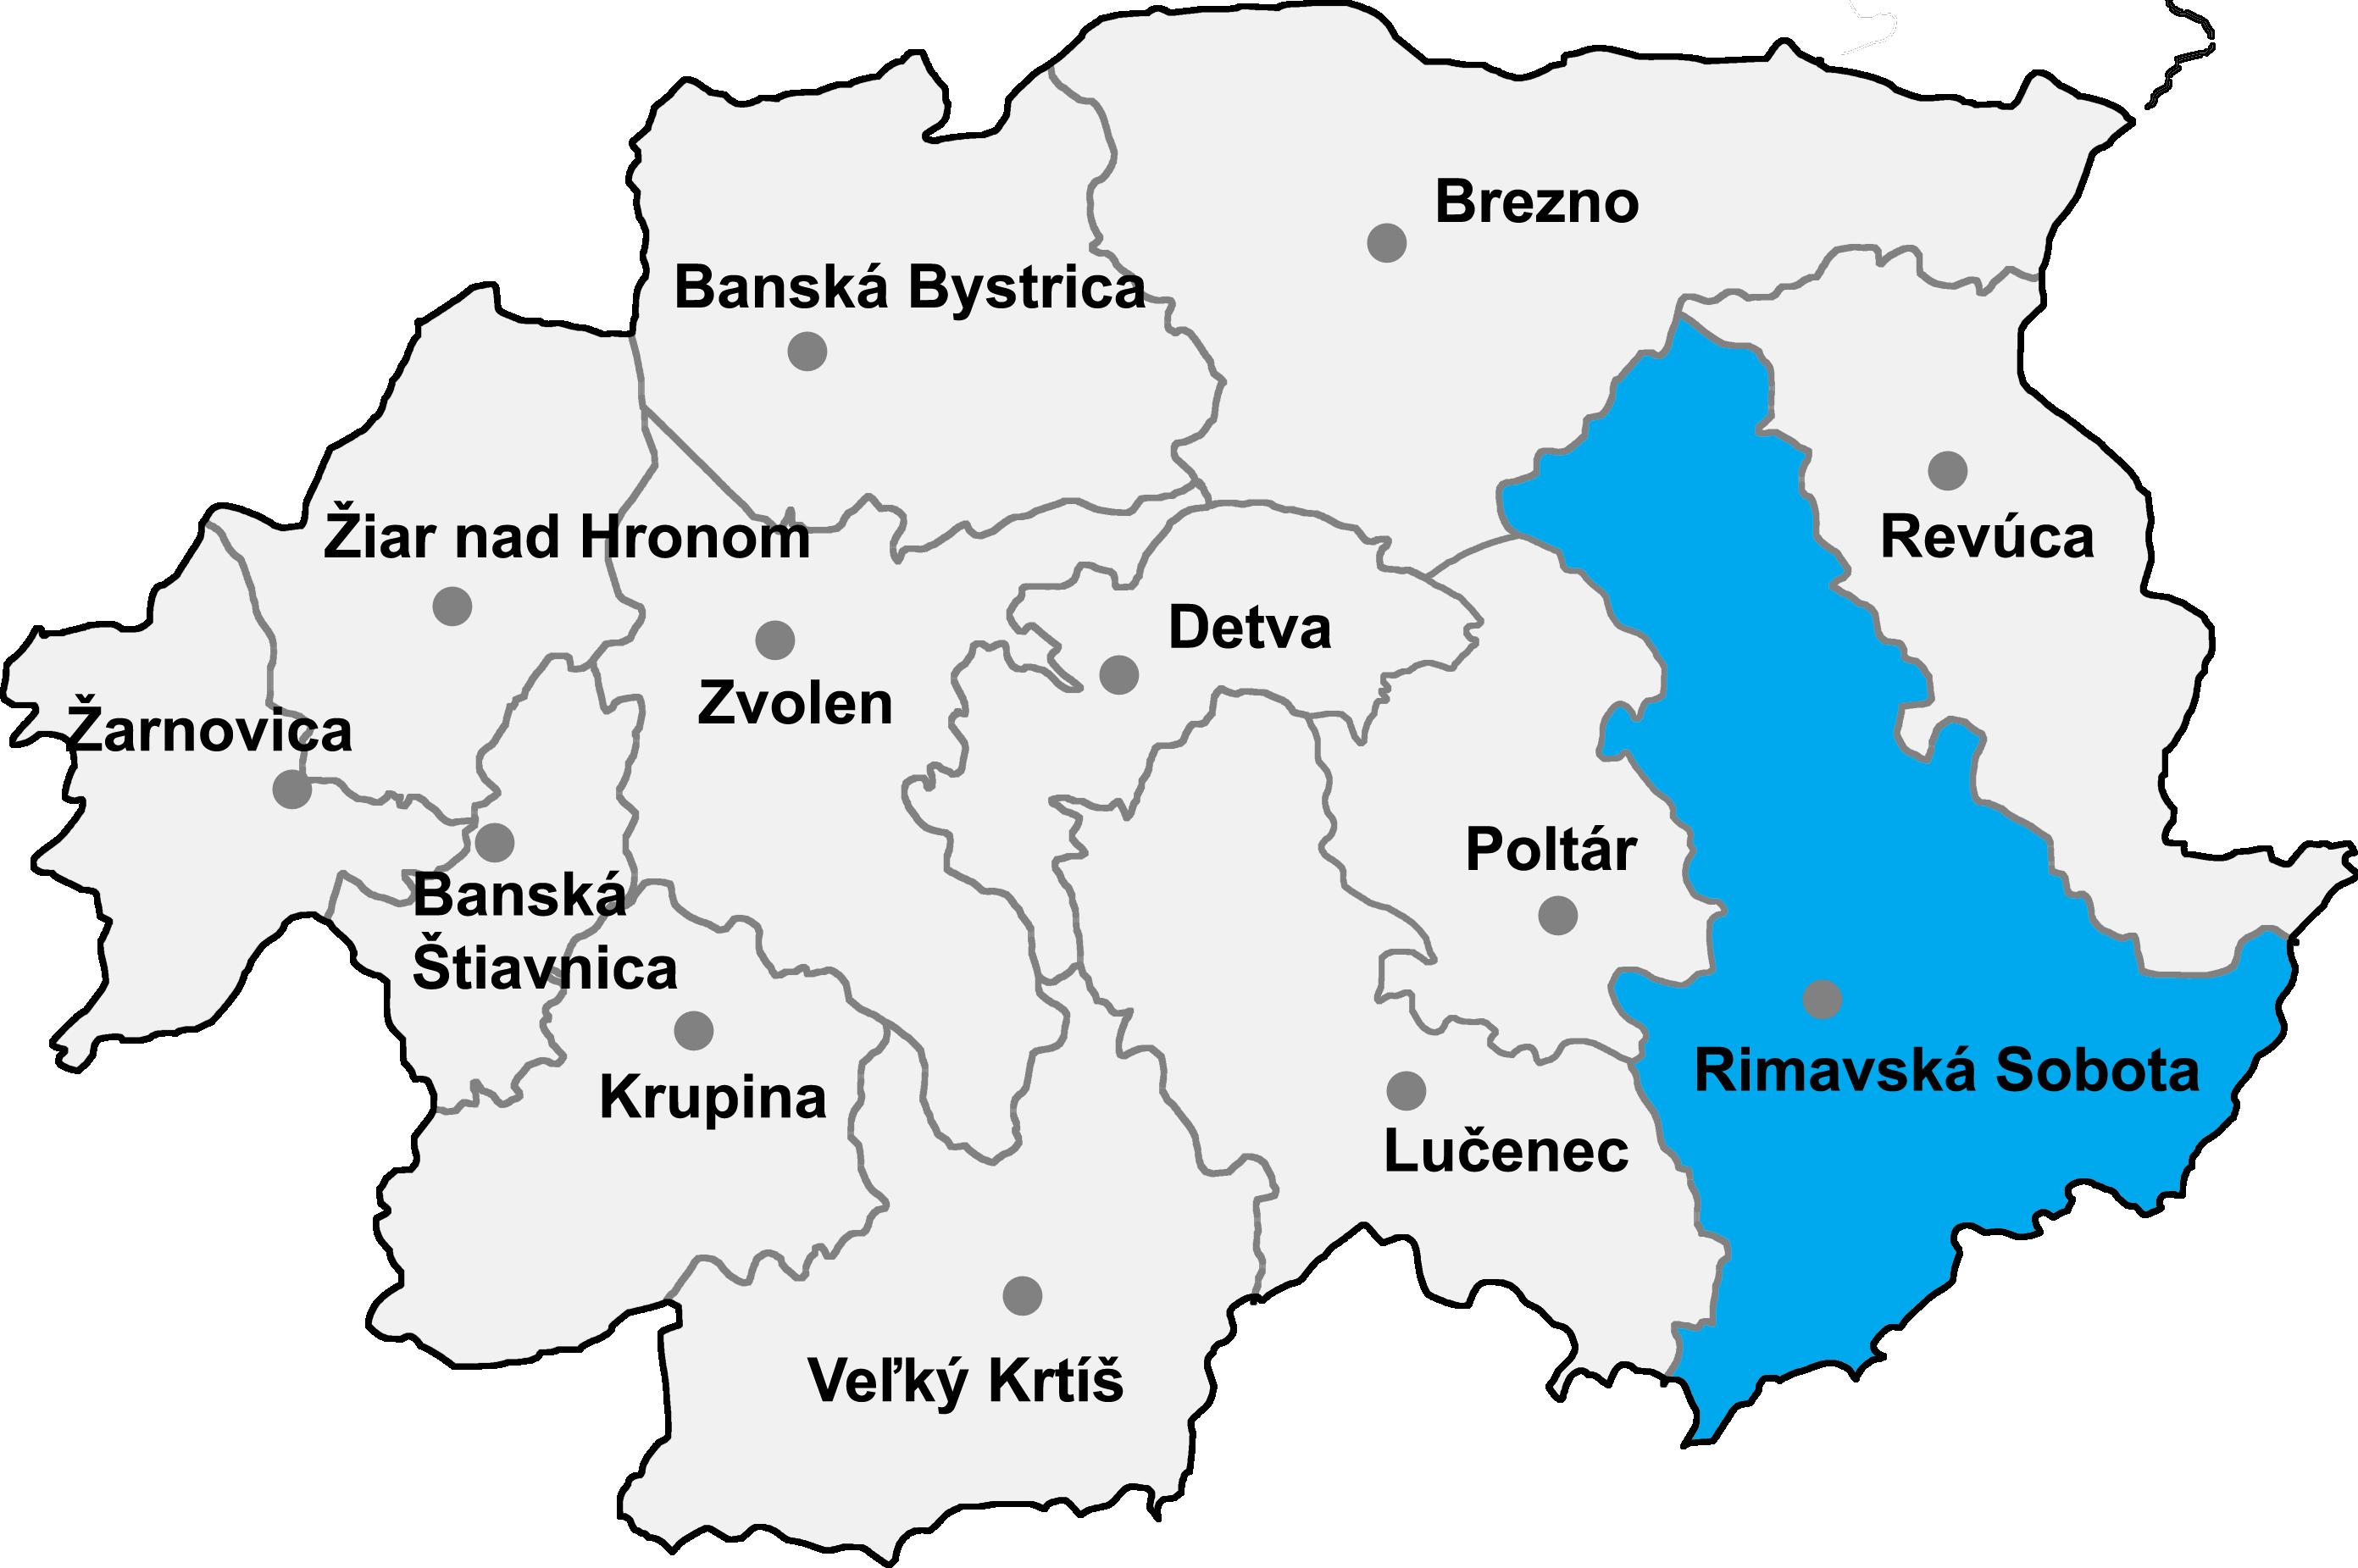 Bildergebnis für rimavska sobota mapa